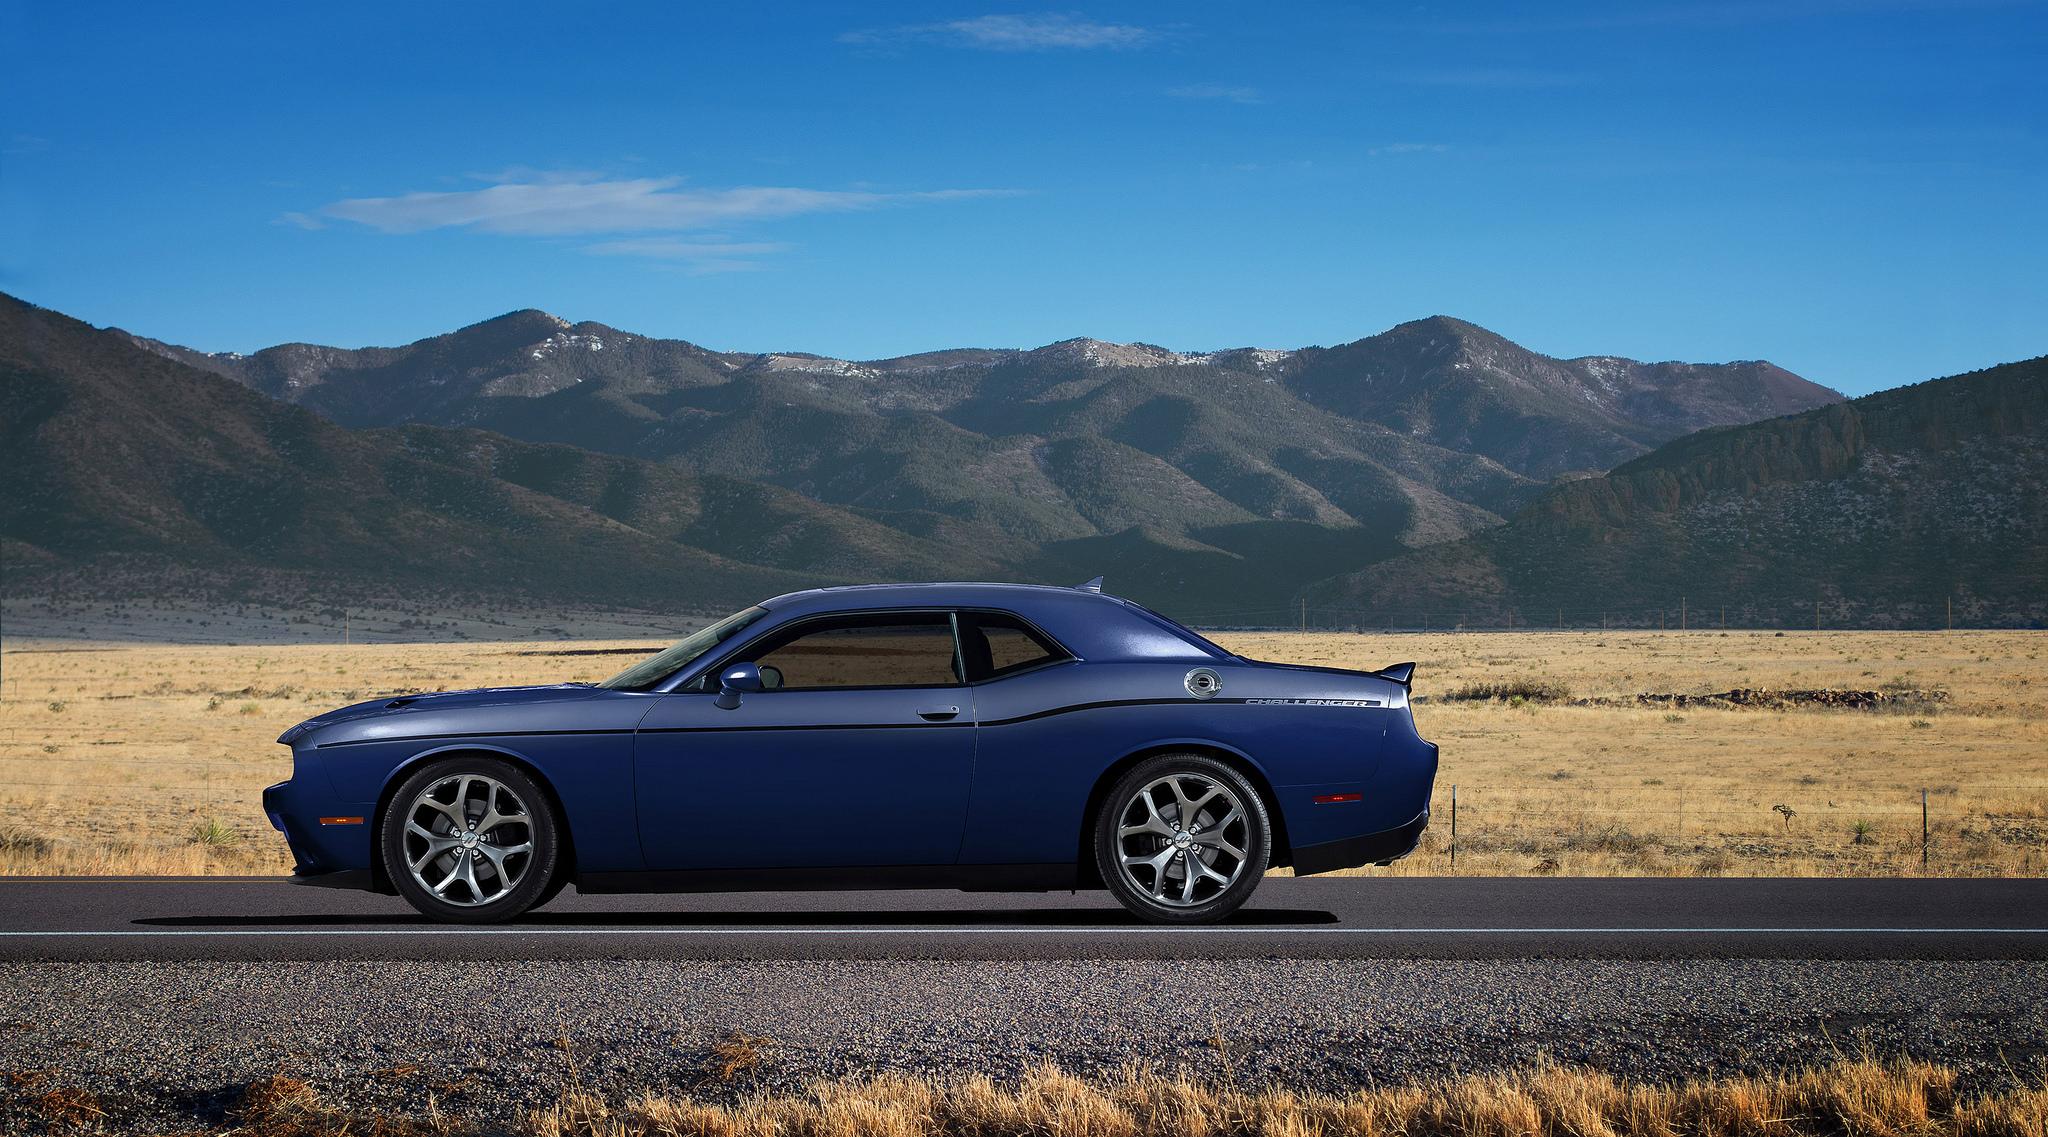 2018 Dodge Challenger Sxt Delivers Sporty Performance